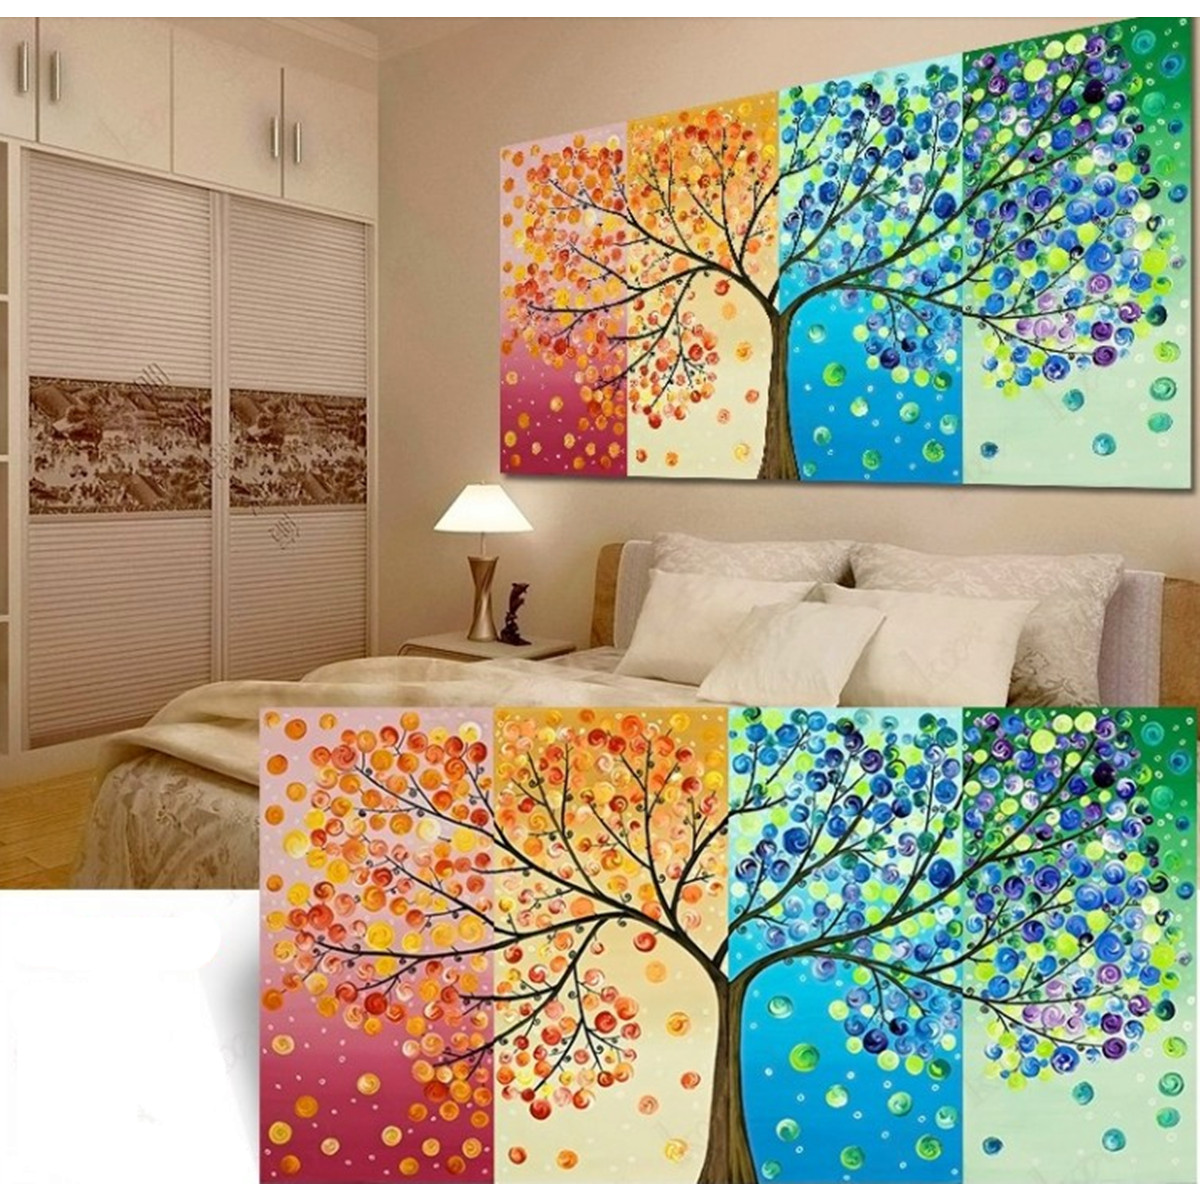 Tree Decor For Home: DIY Handmade Colorful Season Tree Counted Cross Stitch